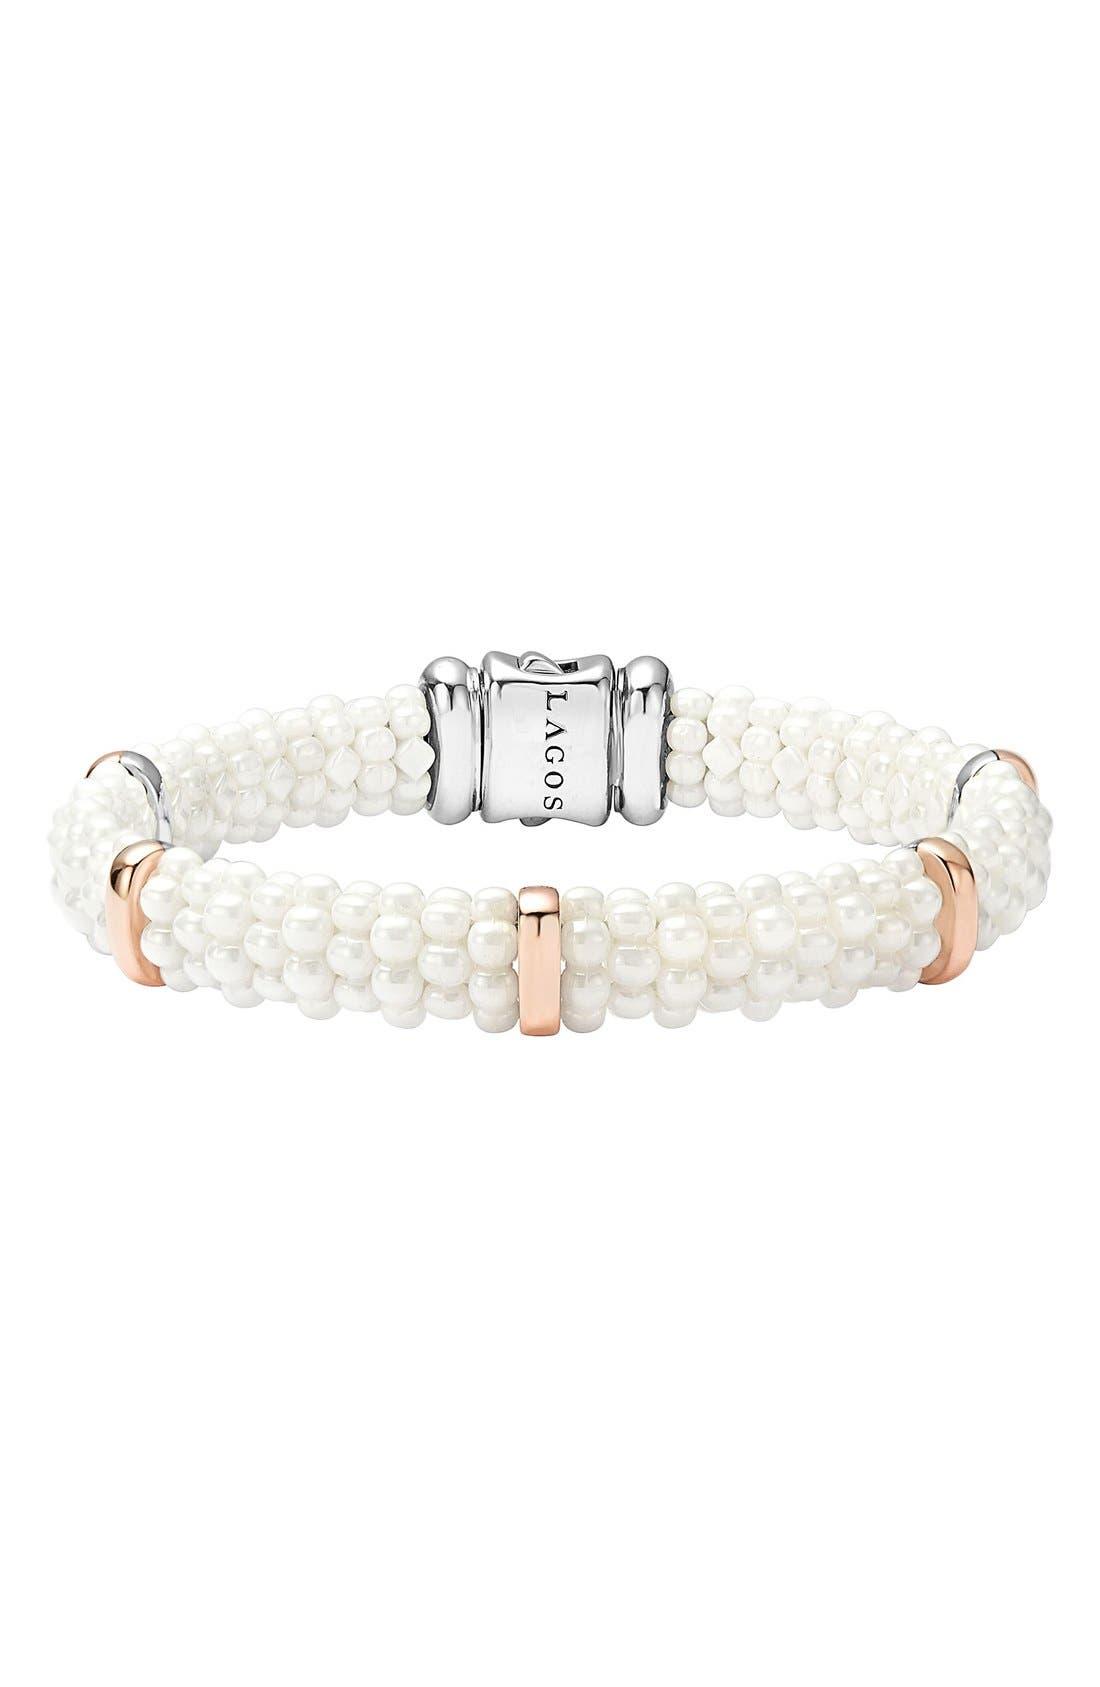 'White Caviar' Five Station Bracelet,                         Main,                         color, White Caviar